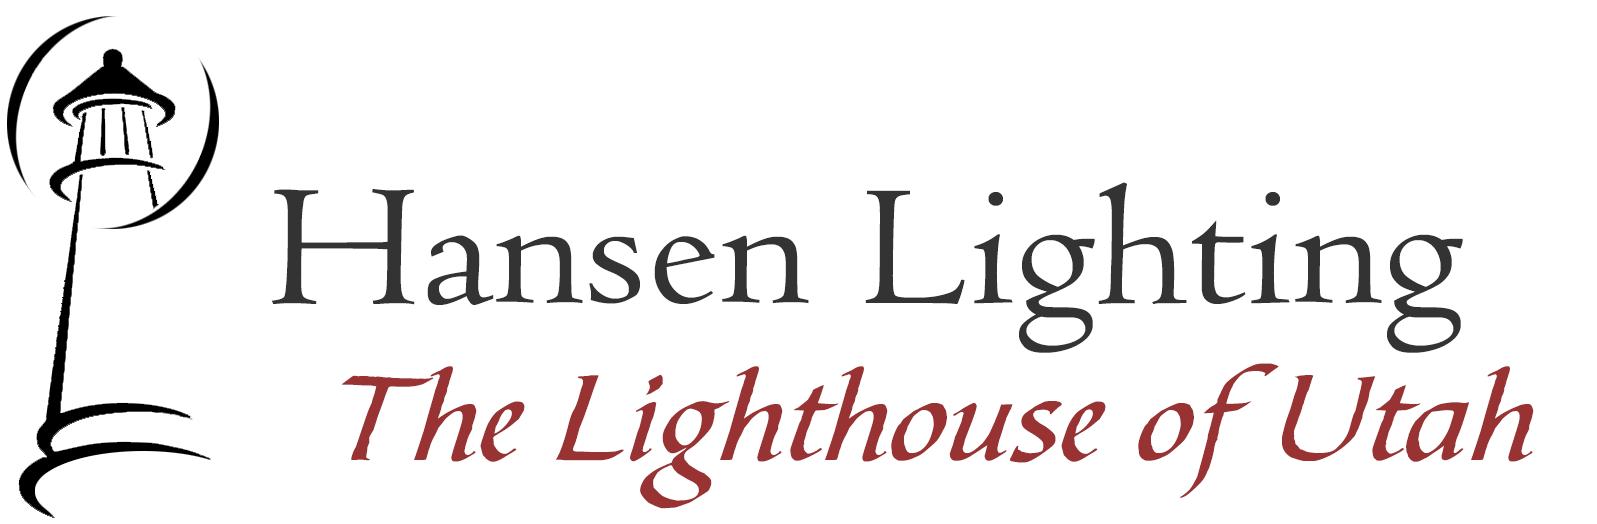 hansen lighting services. hansen lighting services